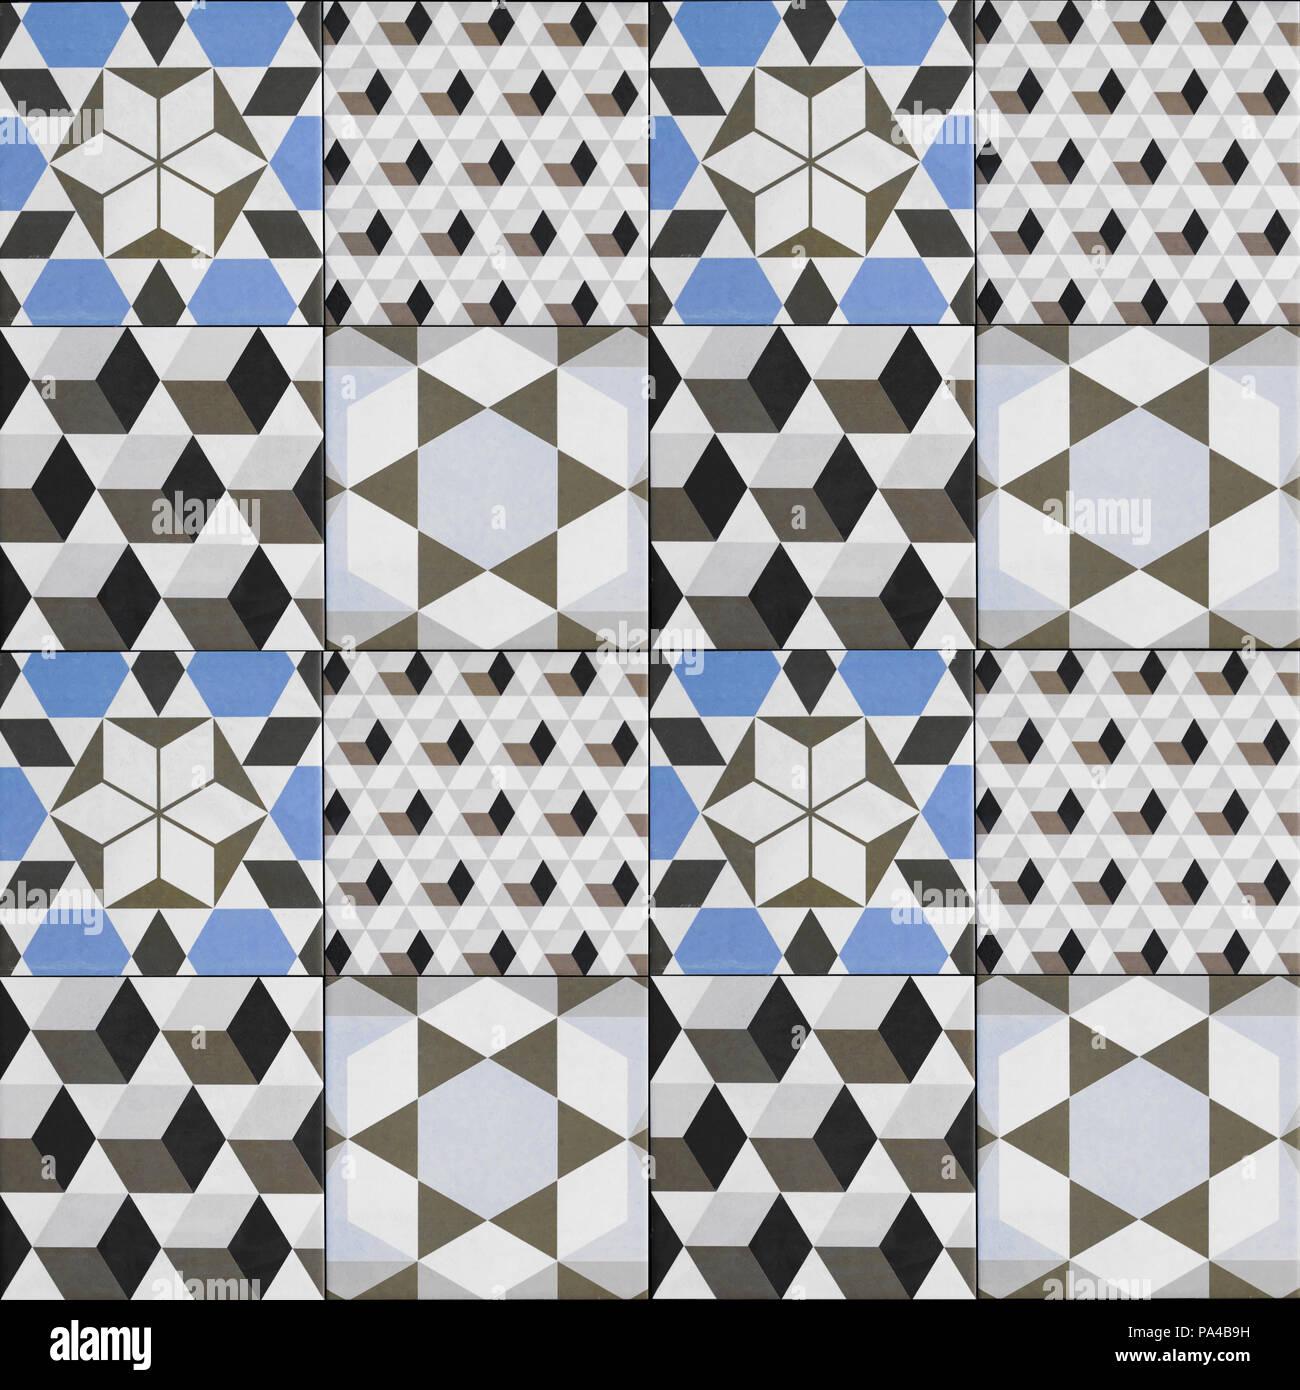 Fliese Muster - Geometrische patchwork Design, dekorative ...